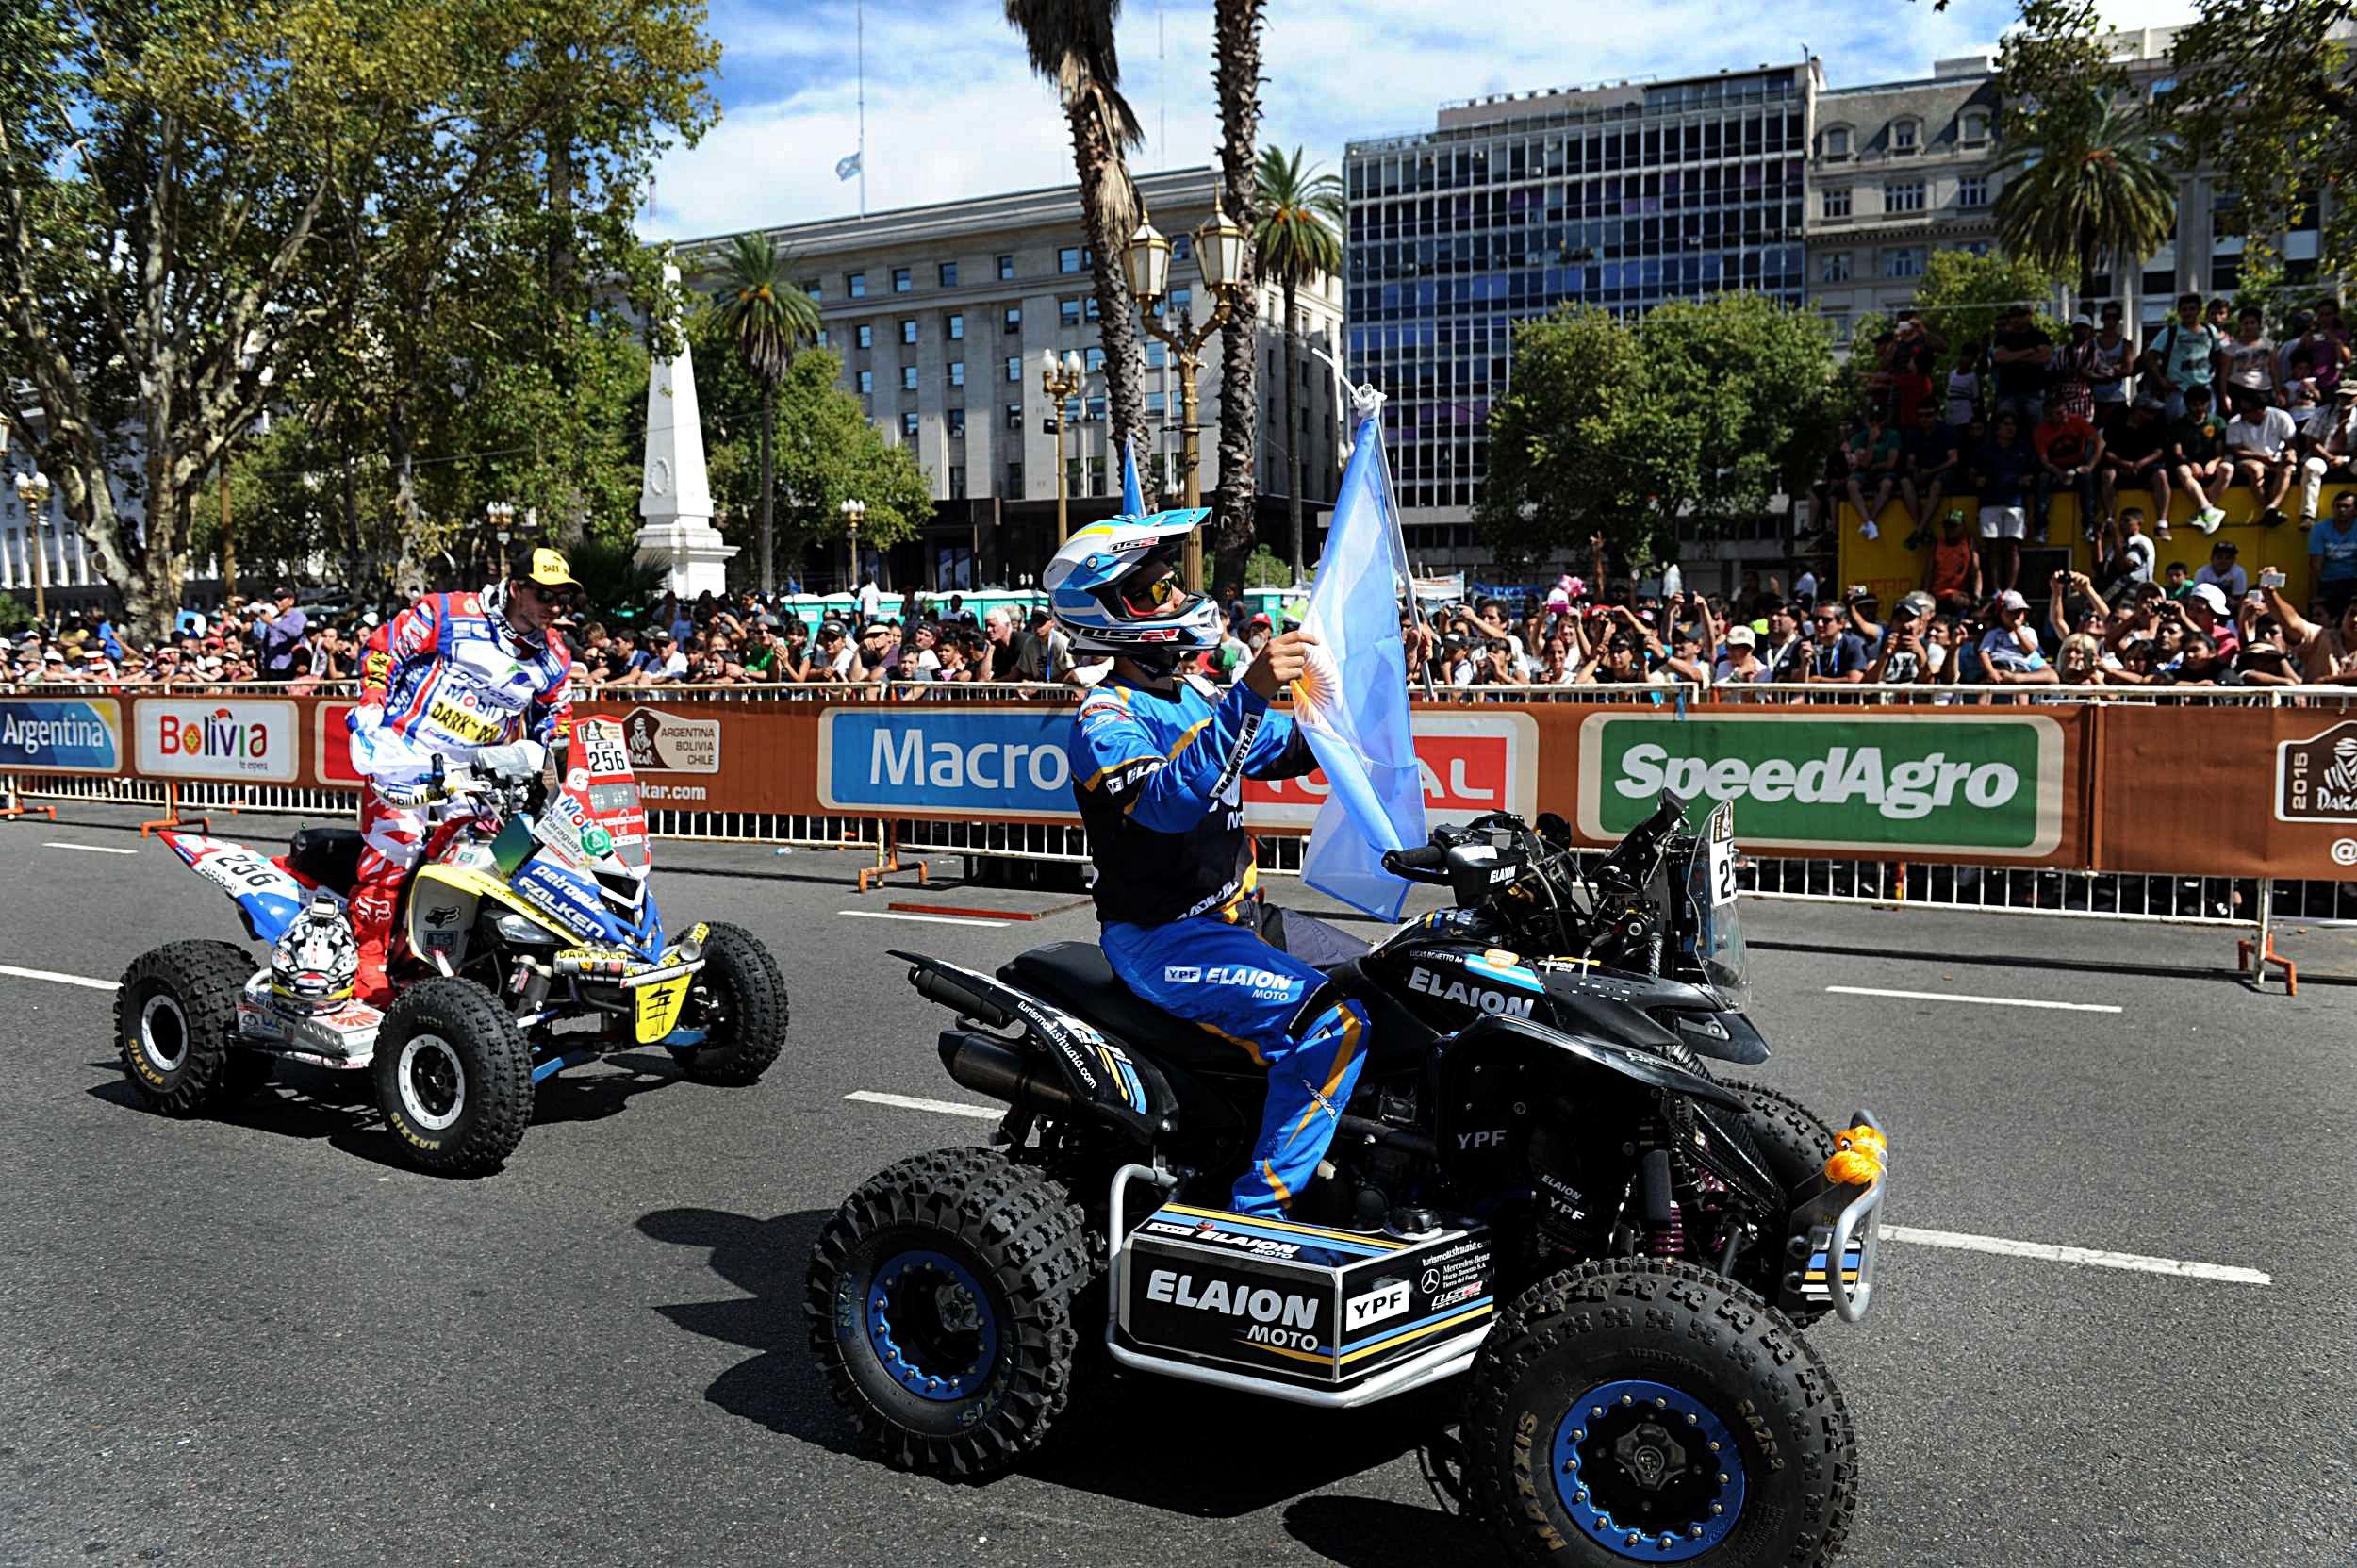 El argentino Sebastian Halperín larga en el Rally Dakar 2015 desde Plaza de Mayo.